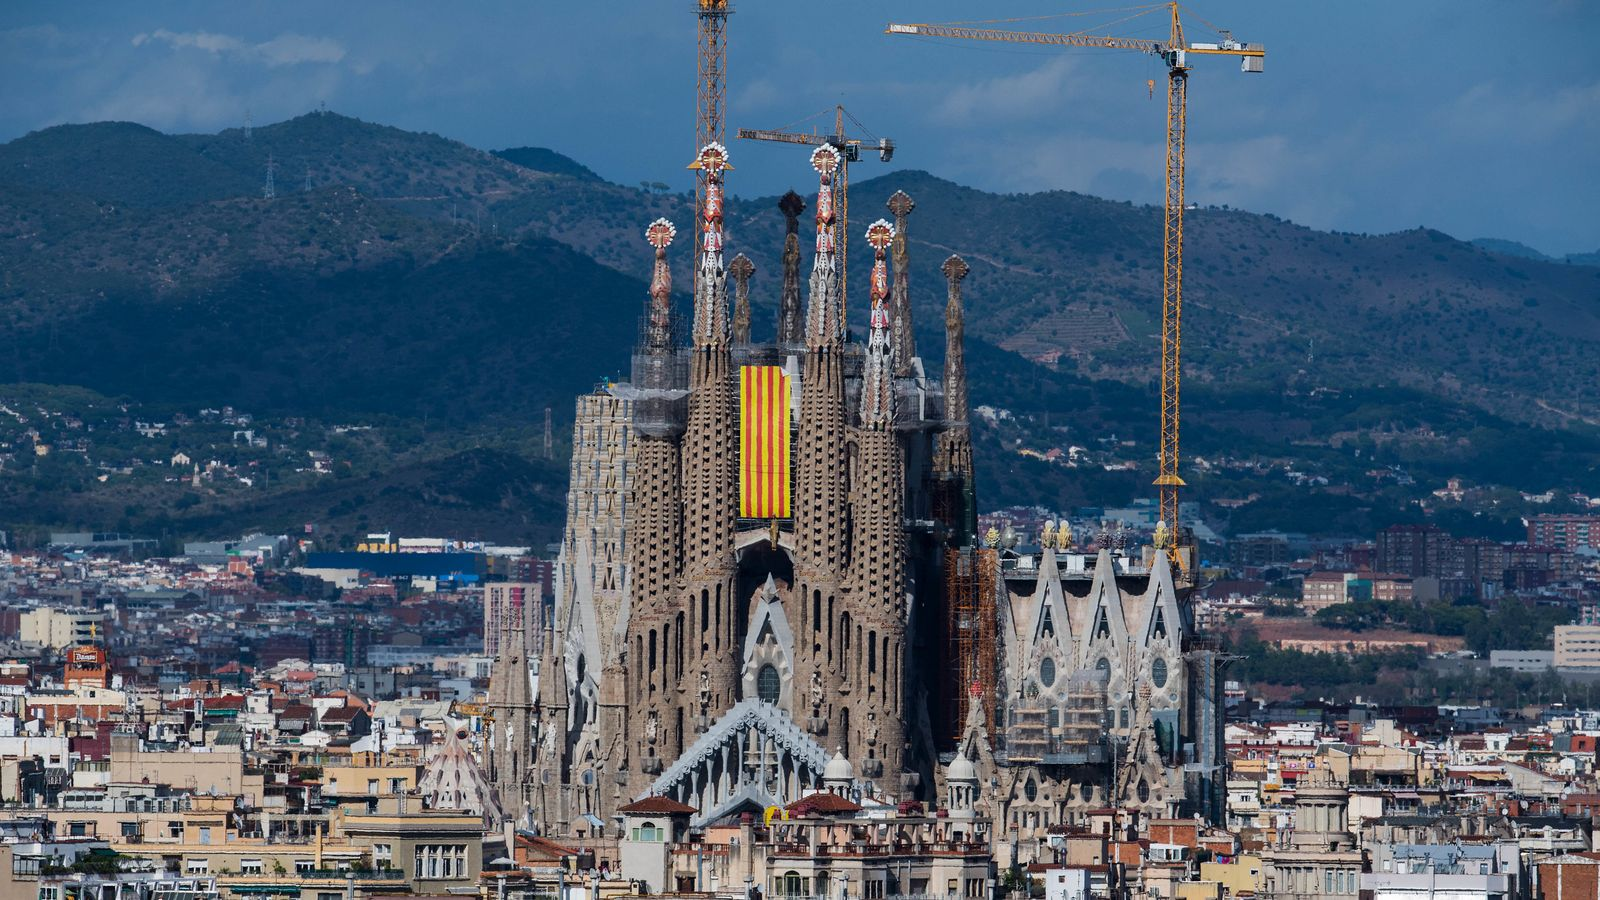 Barcelona's Sagrada Familia gets building permit after 137 years